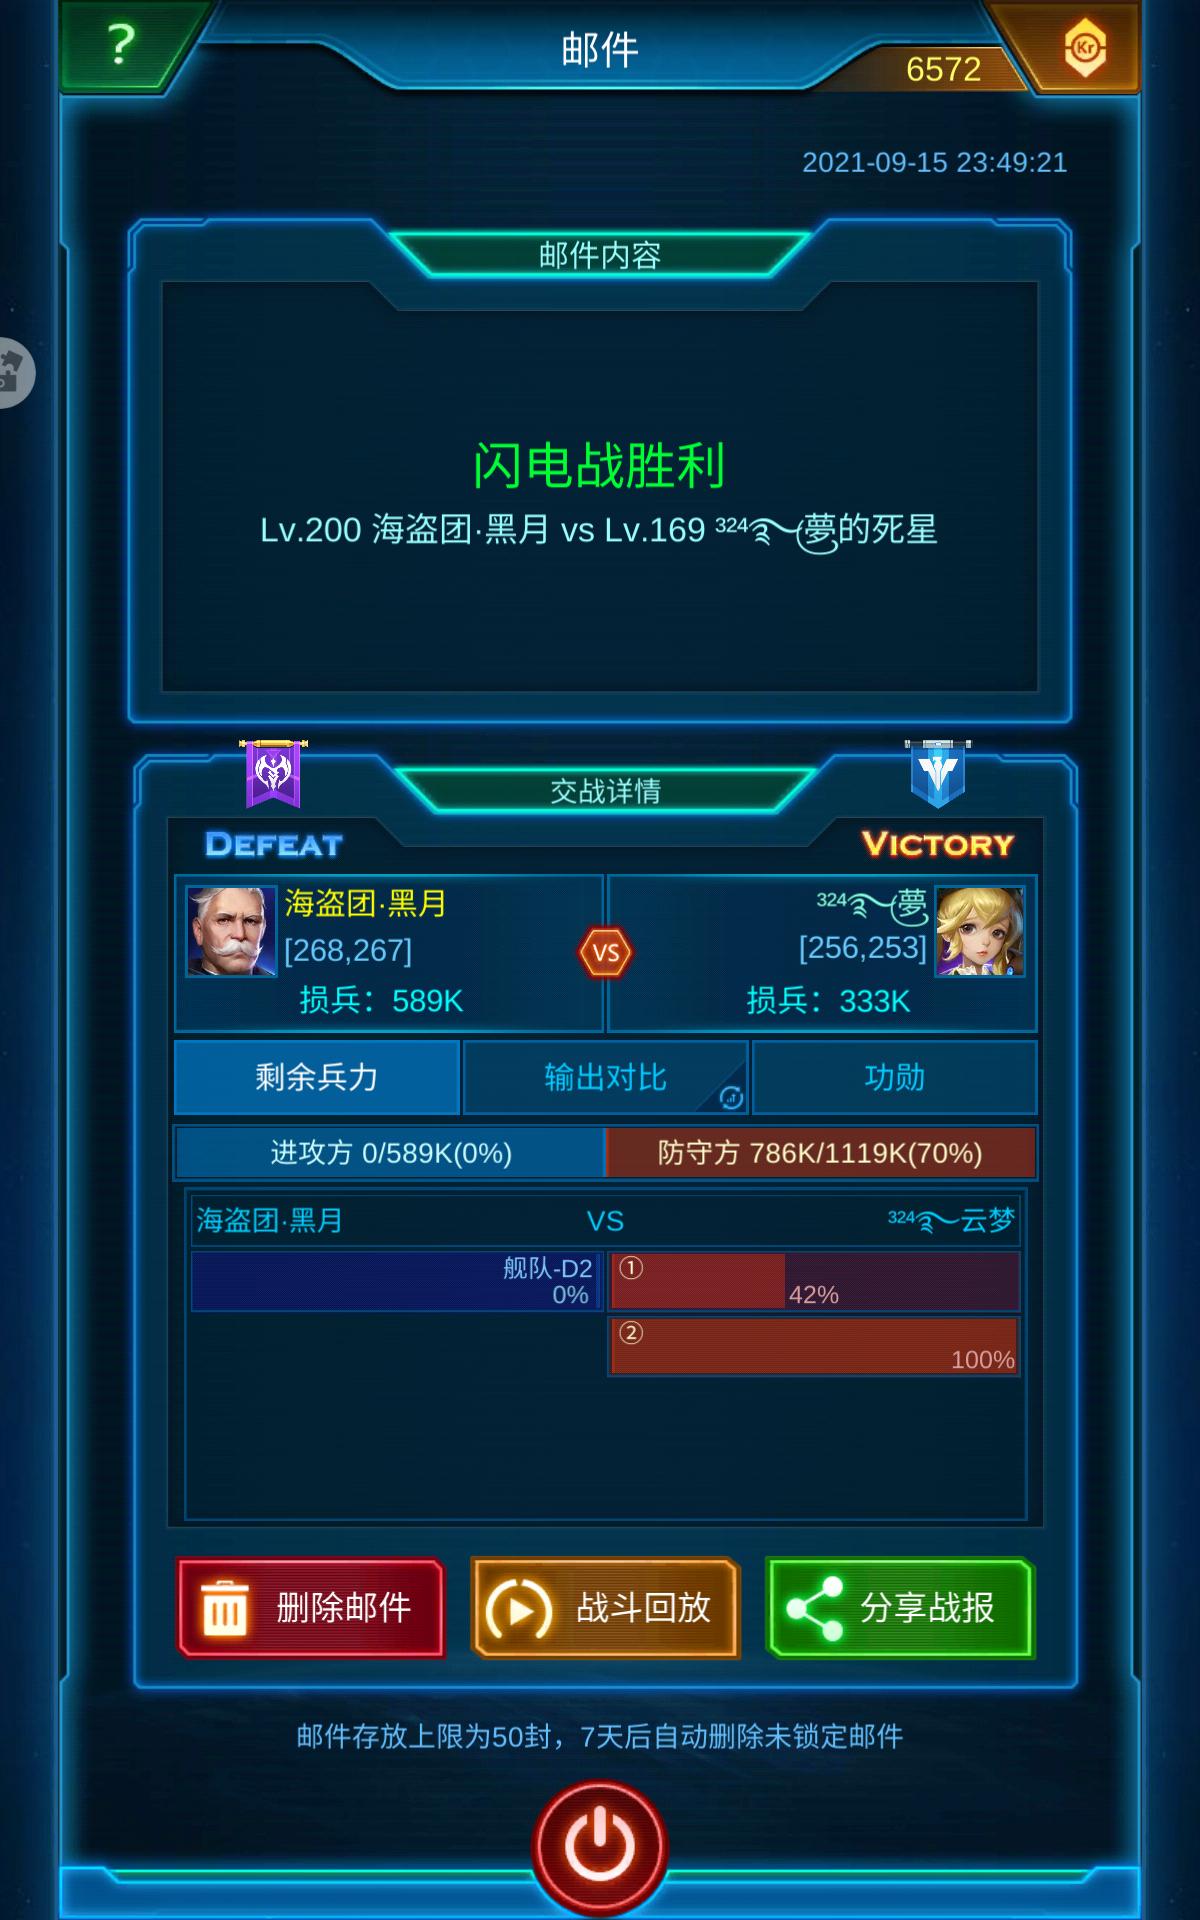 Screenshot_2021-09-15-23-49-33-960_com.jedigames.p16s.huawei.png